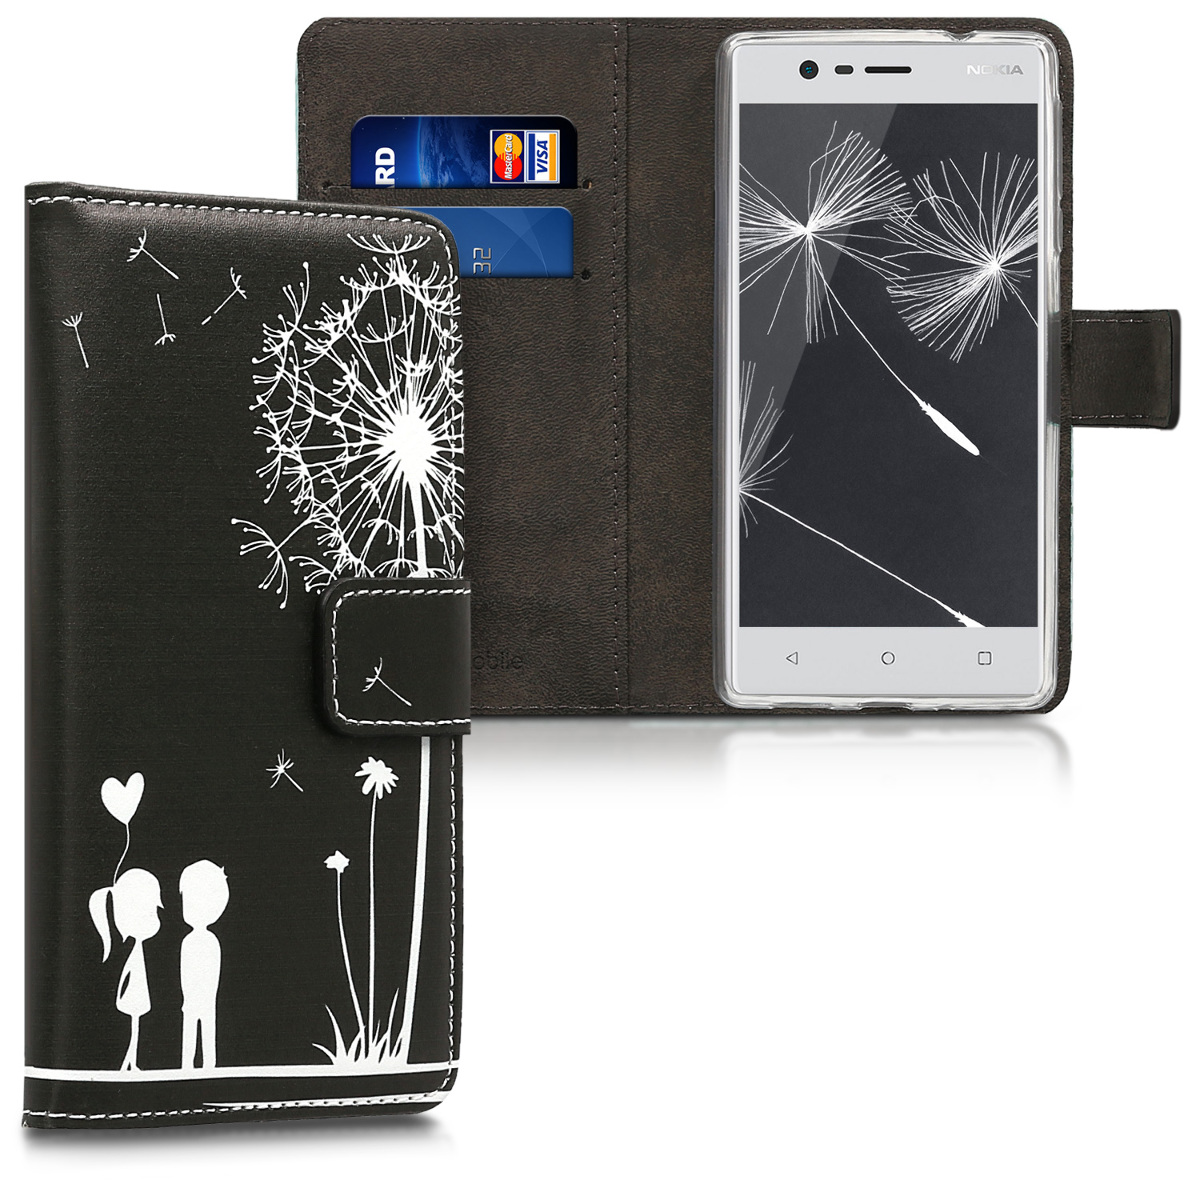 KW Θήκη Πορτοφόλι Nokia 3 - Συνθετικό δέρμα - White / Black (42663.02)